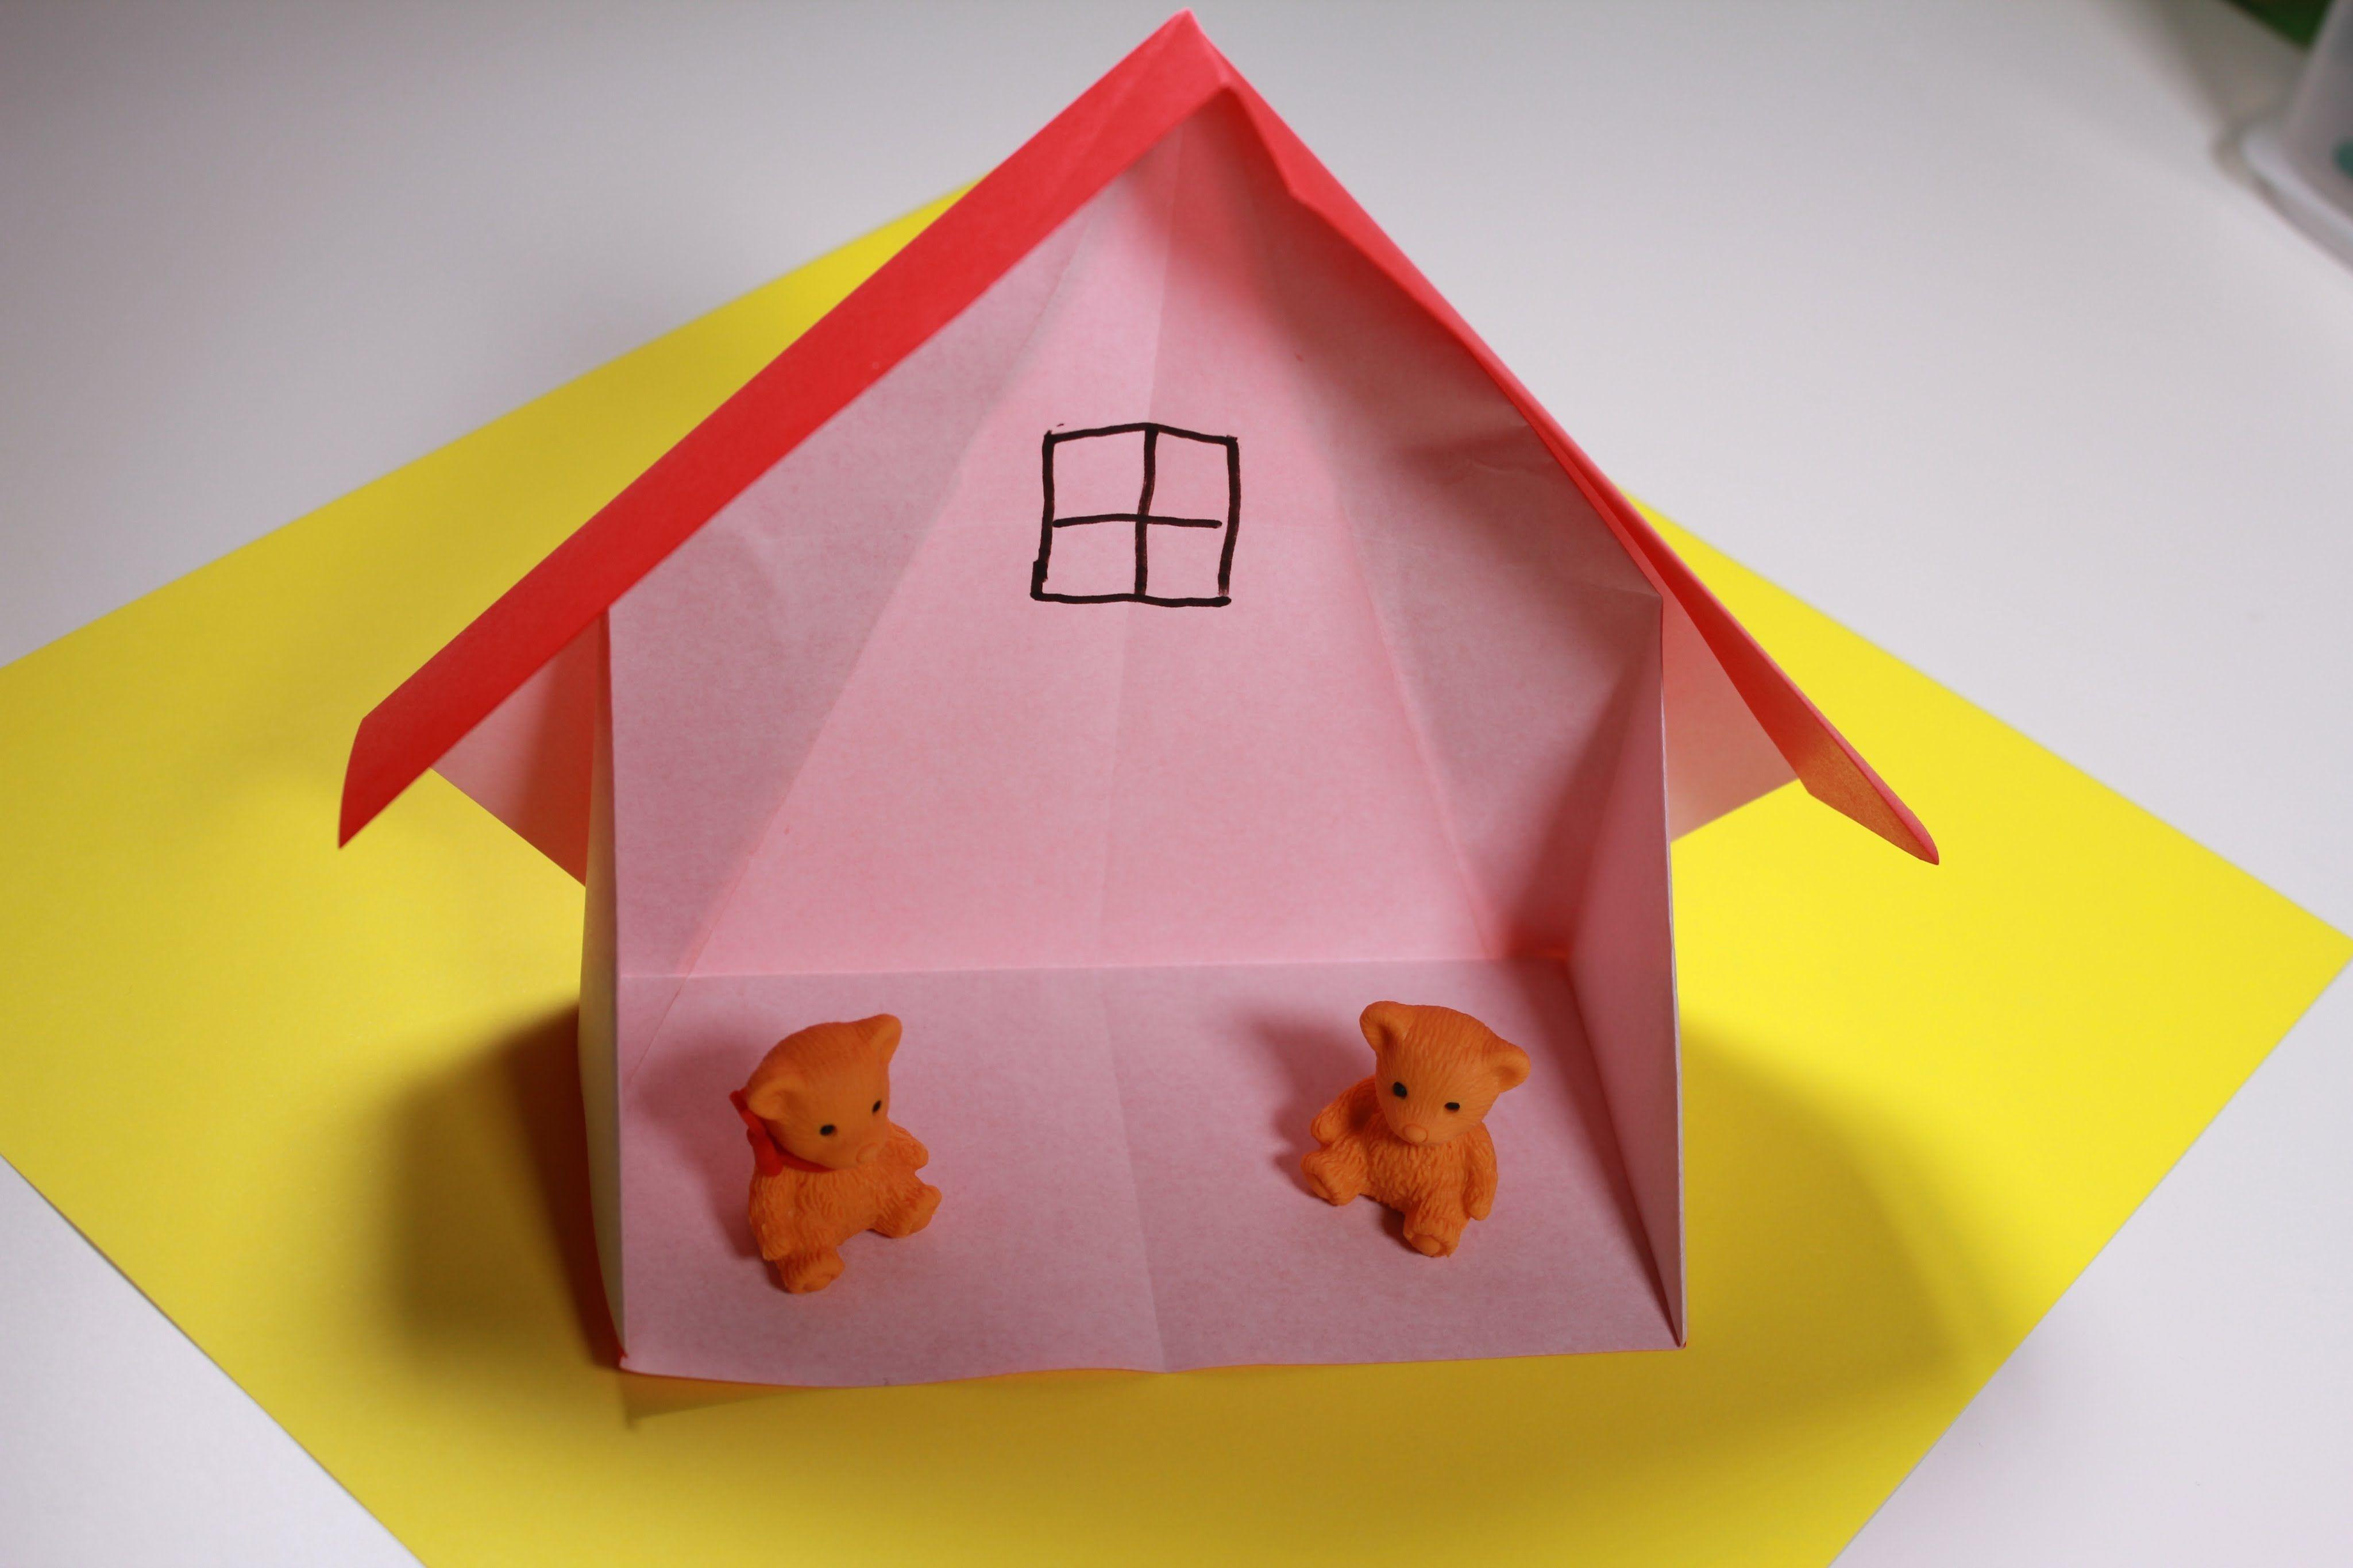 How To Origami Doll House Noel 折り紙 折り紙 簡単 おりがみ